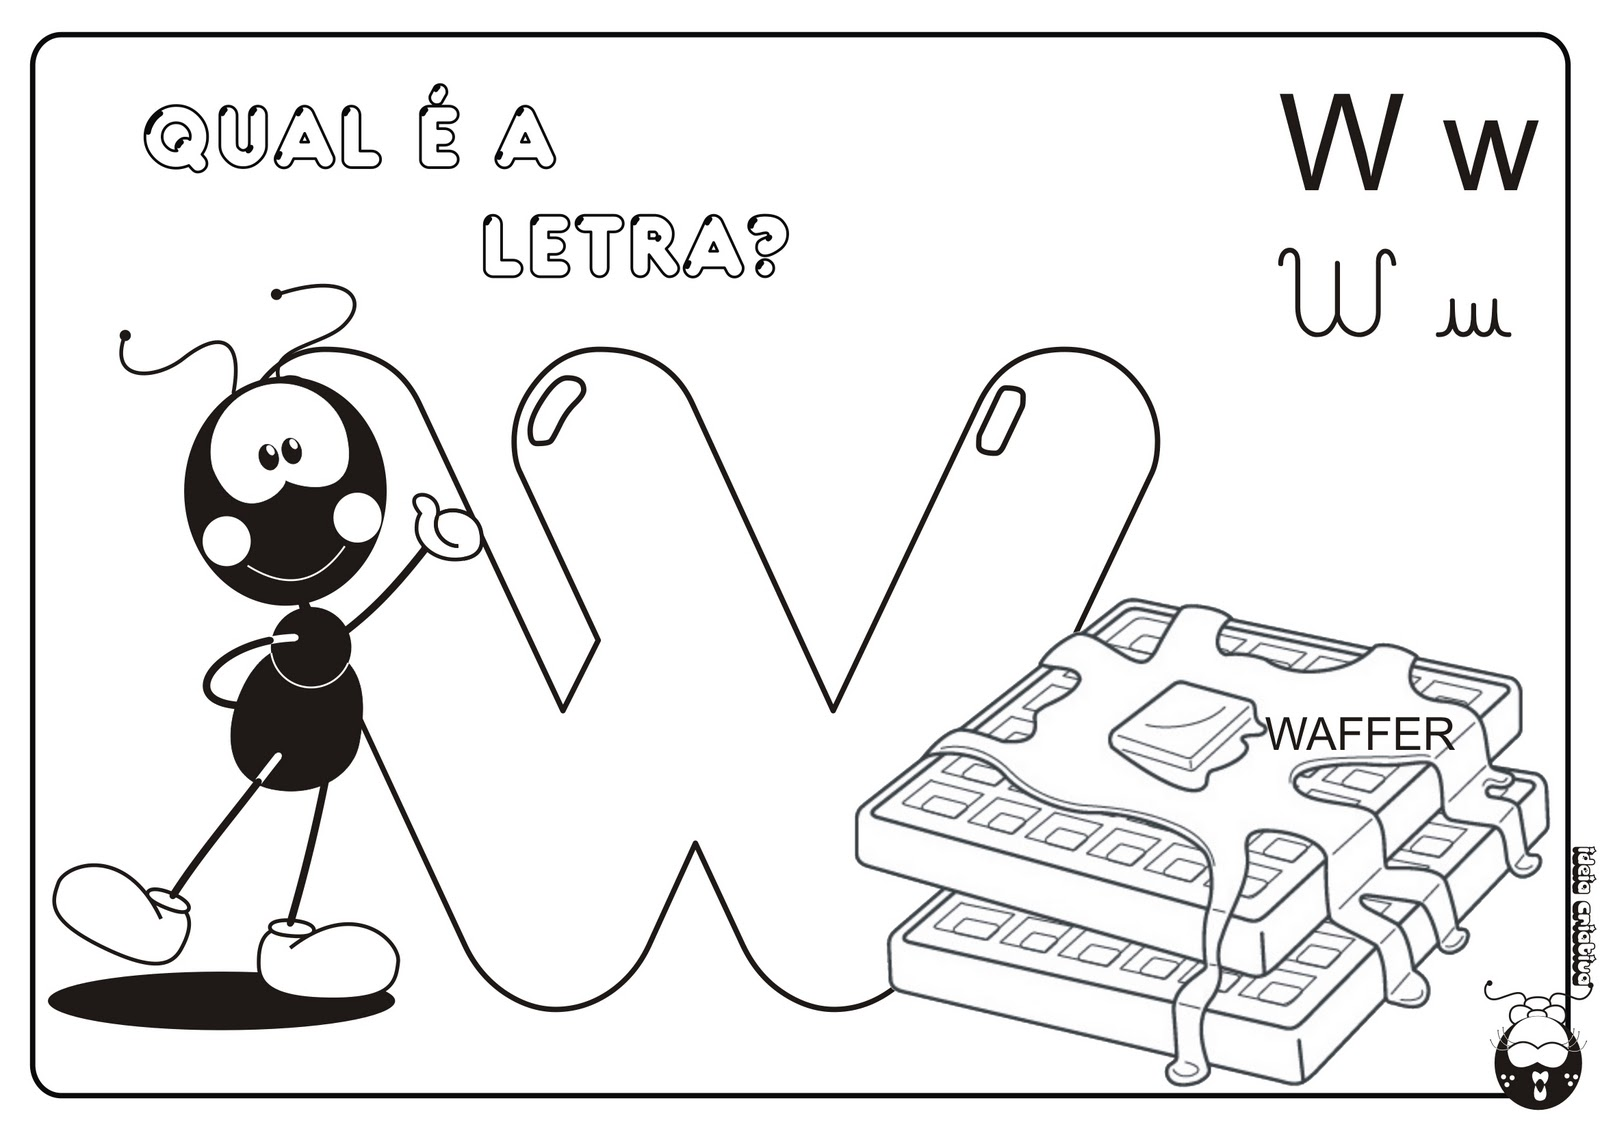 Alfabeto Smilinguido 4 tipos de letra para Baixar Grátis Letra w